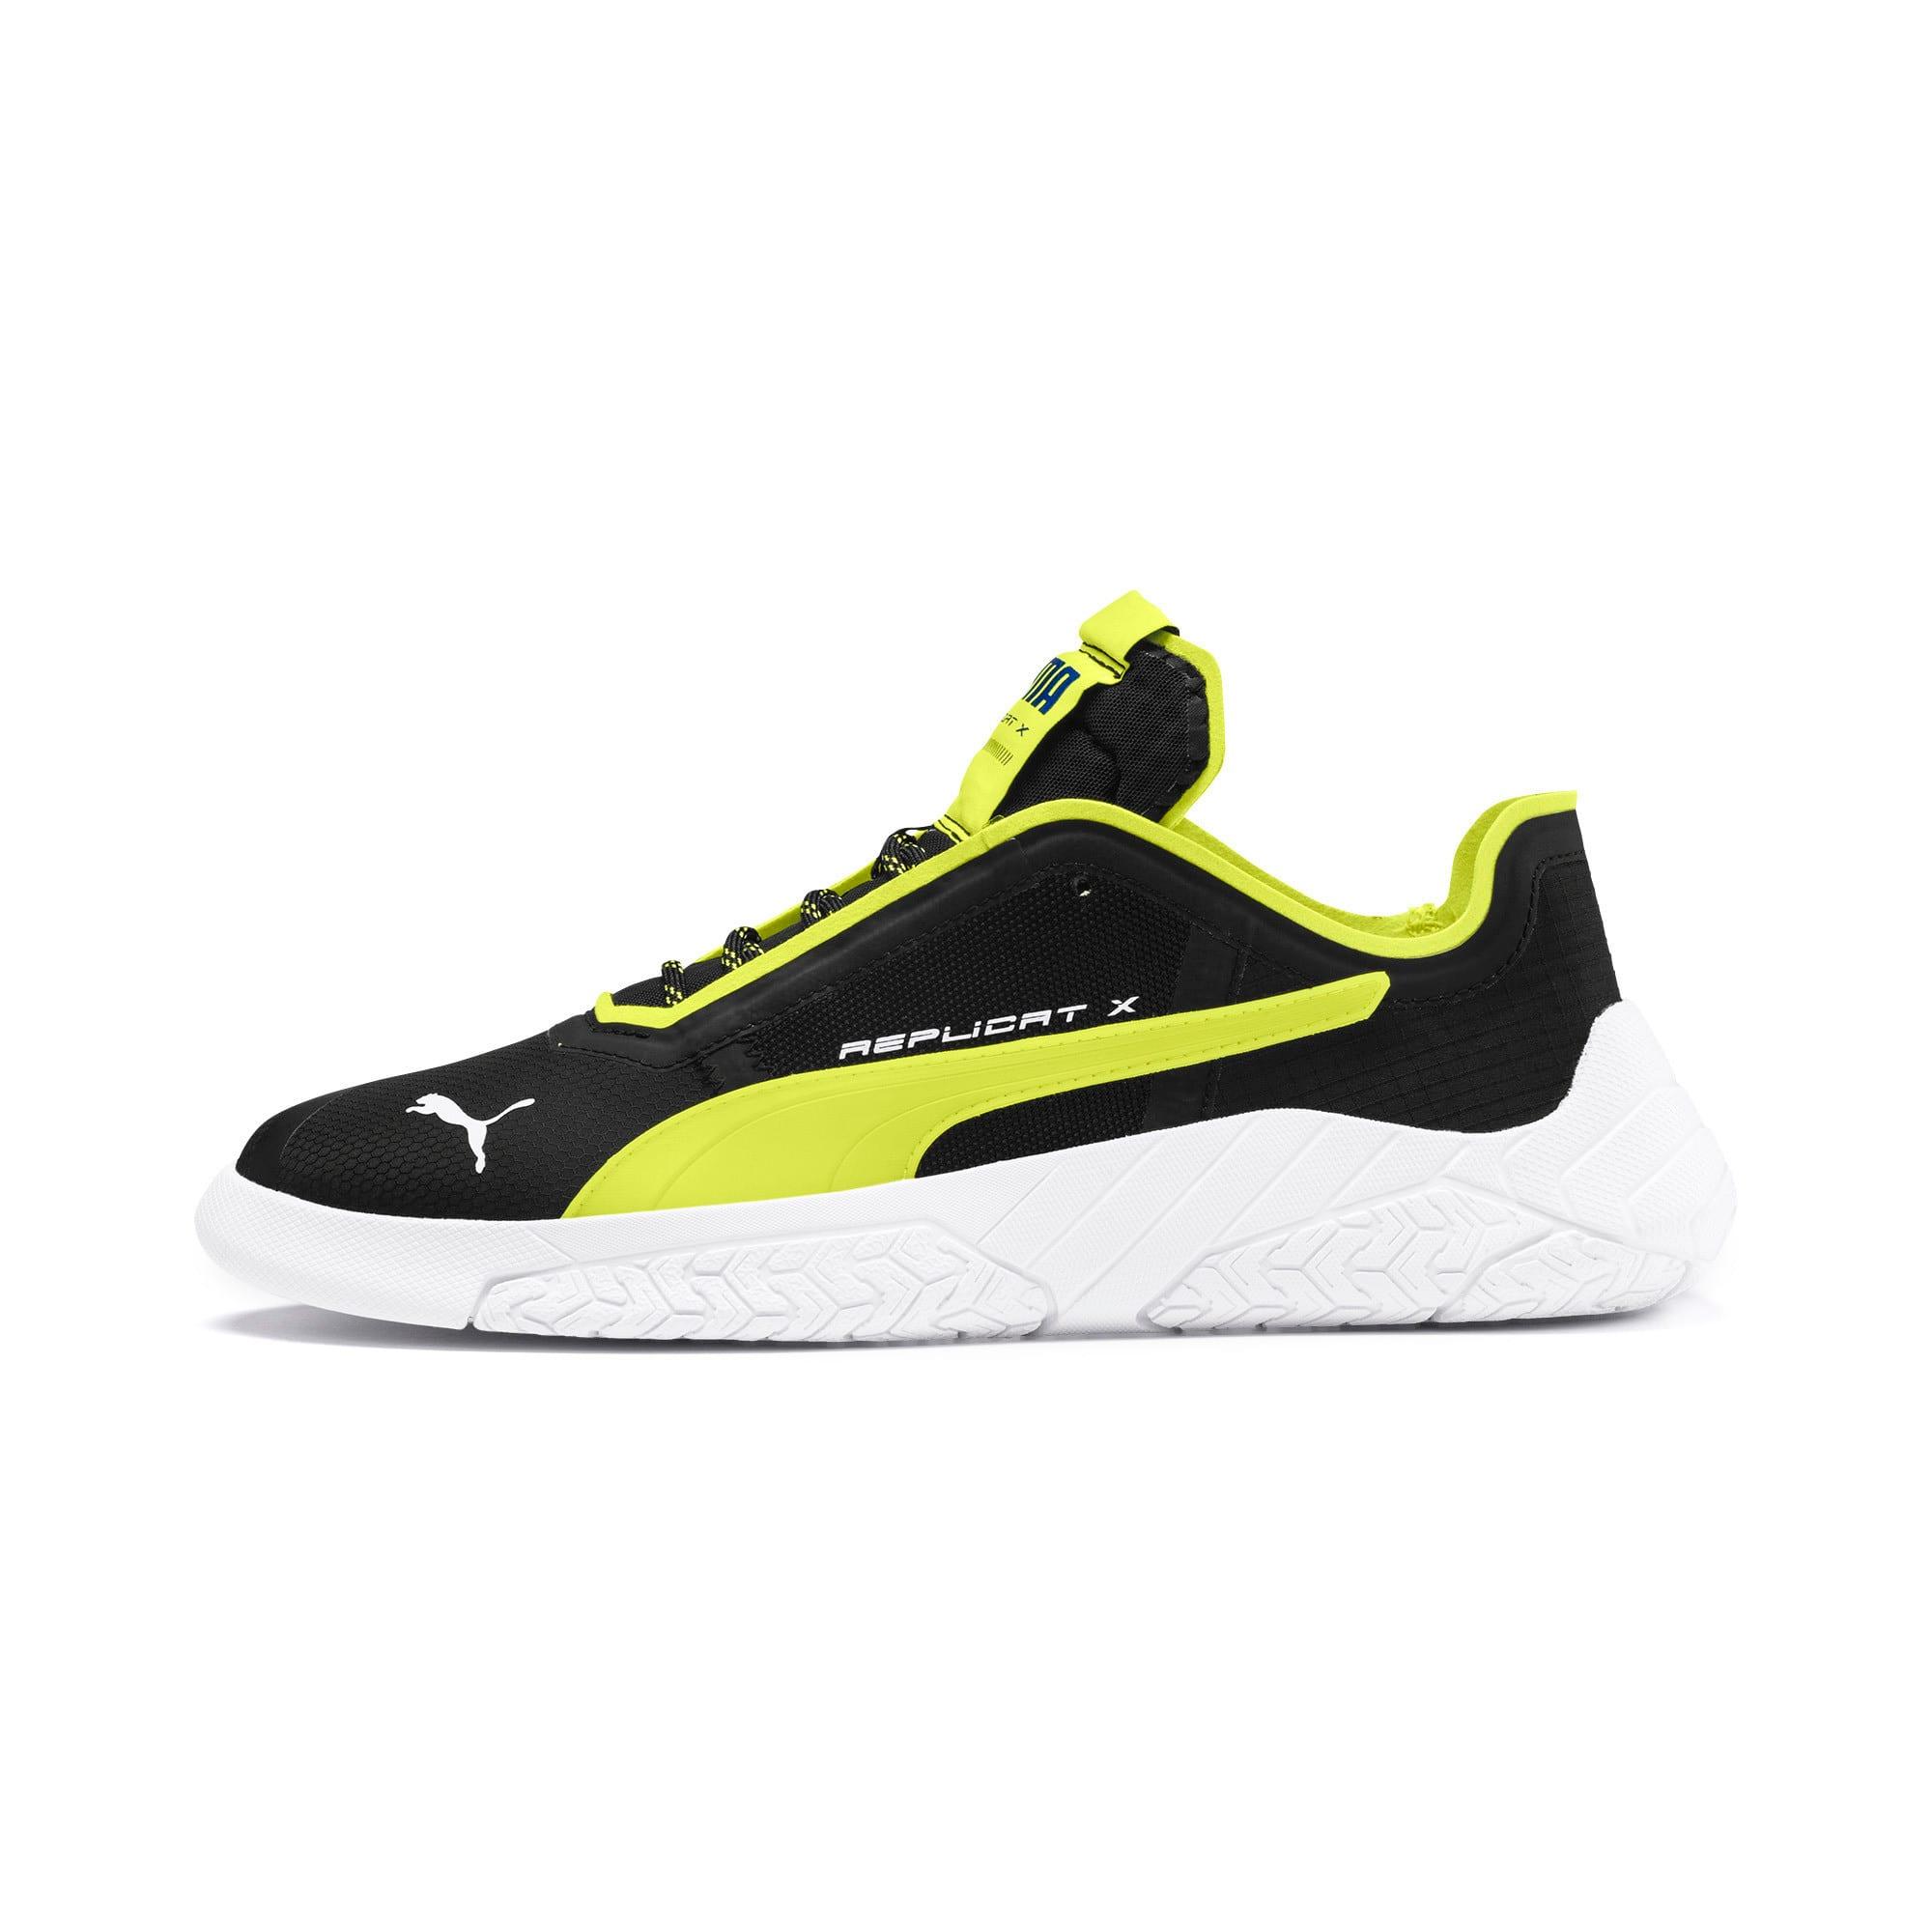 Thumbnail 1 of Replicat-X Circuit Motorsport Shoes, Black-Fizzy Yellow-White, medium